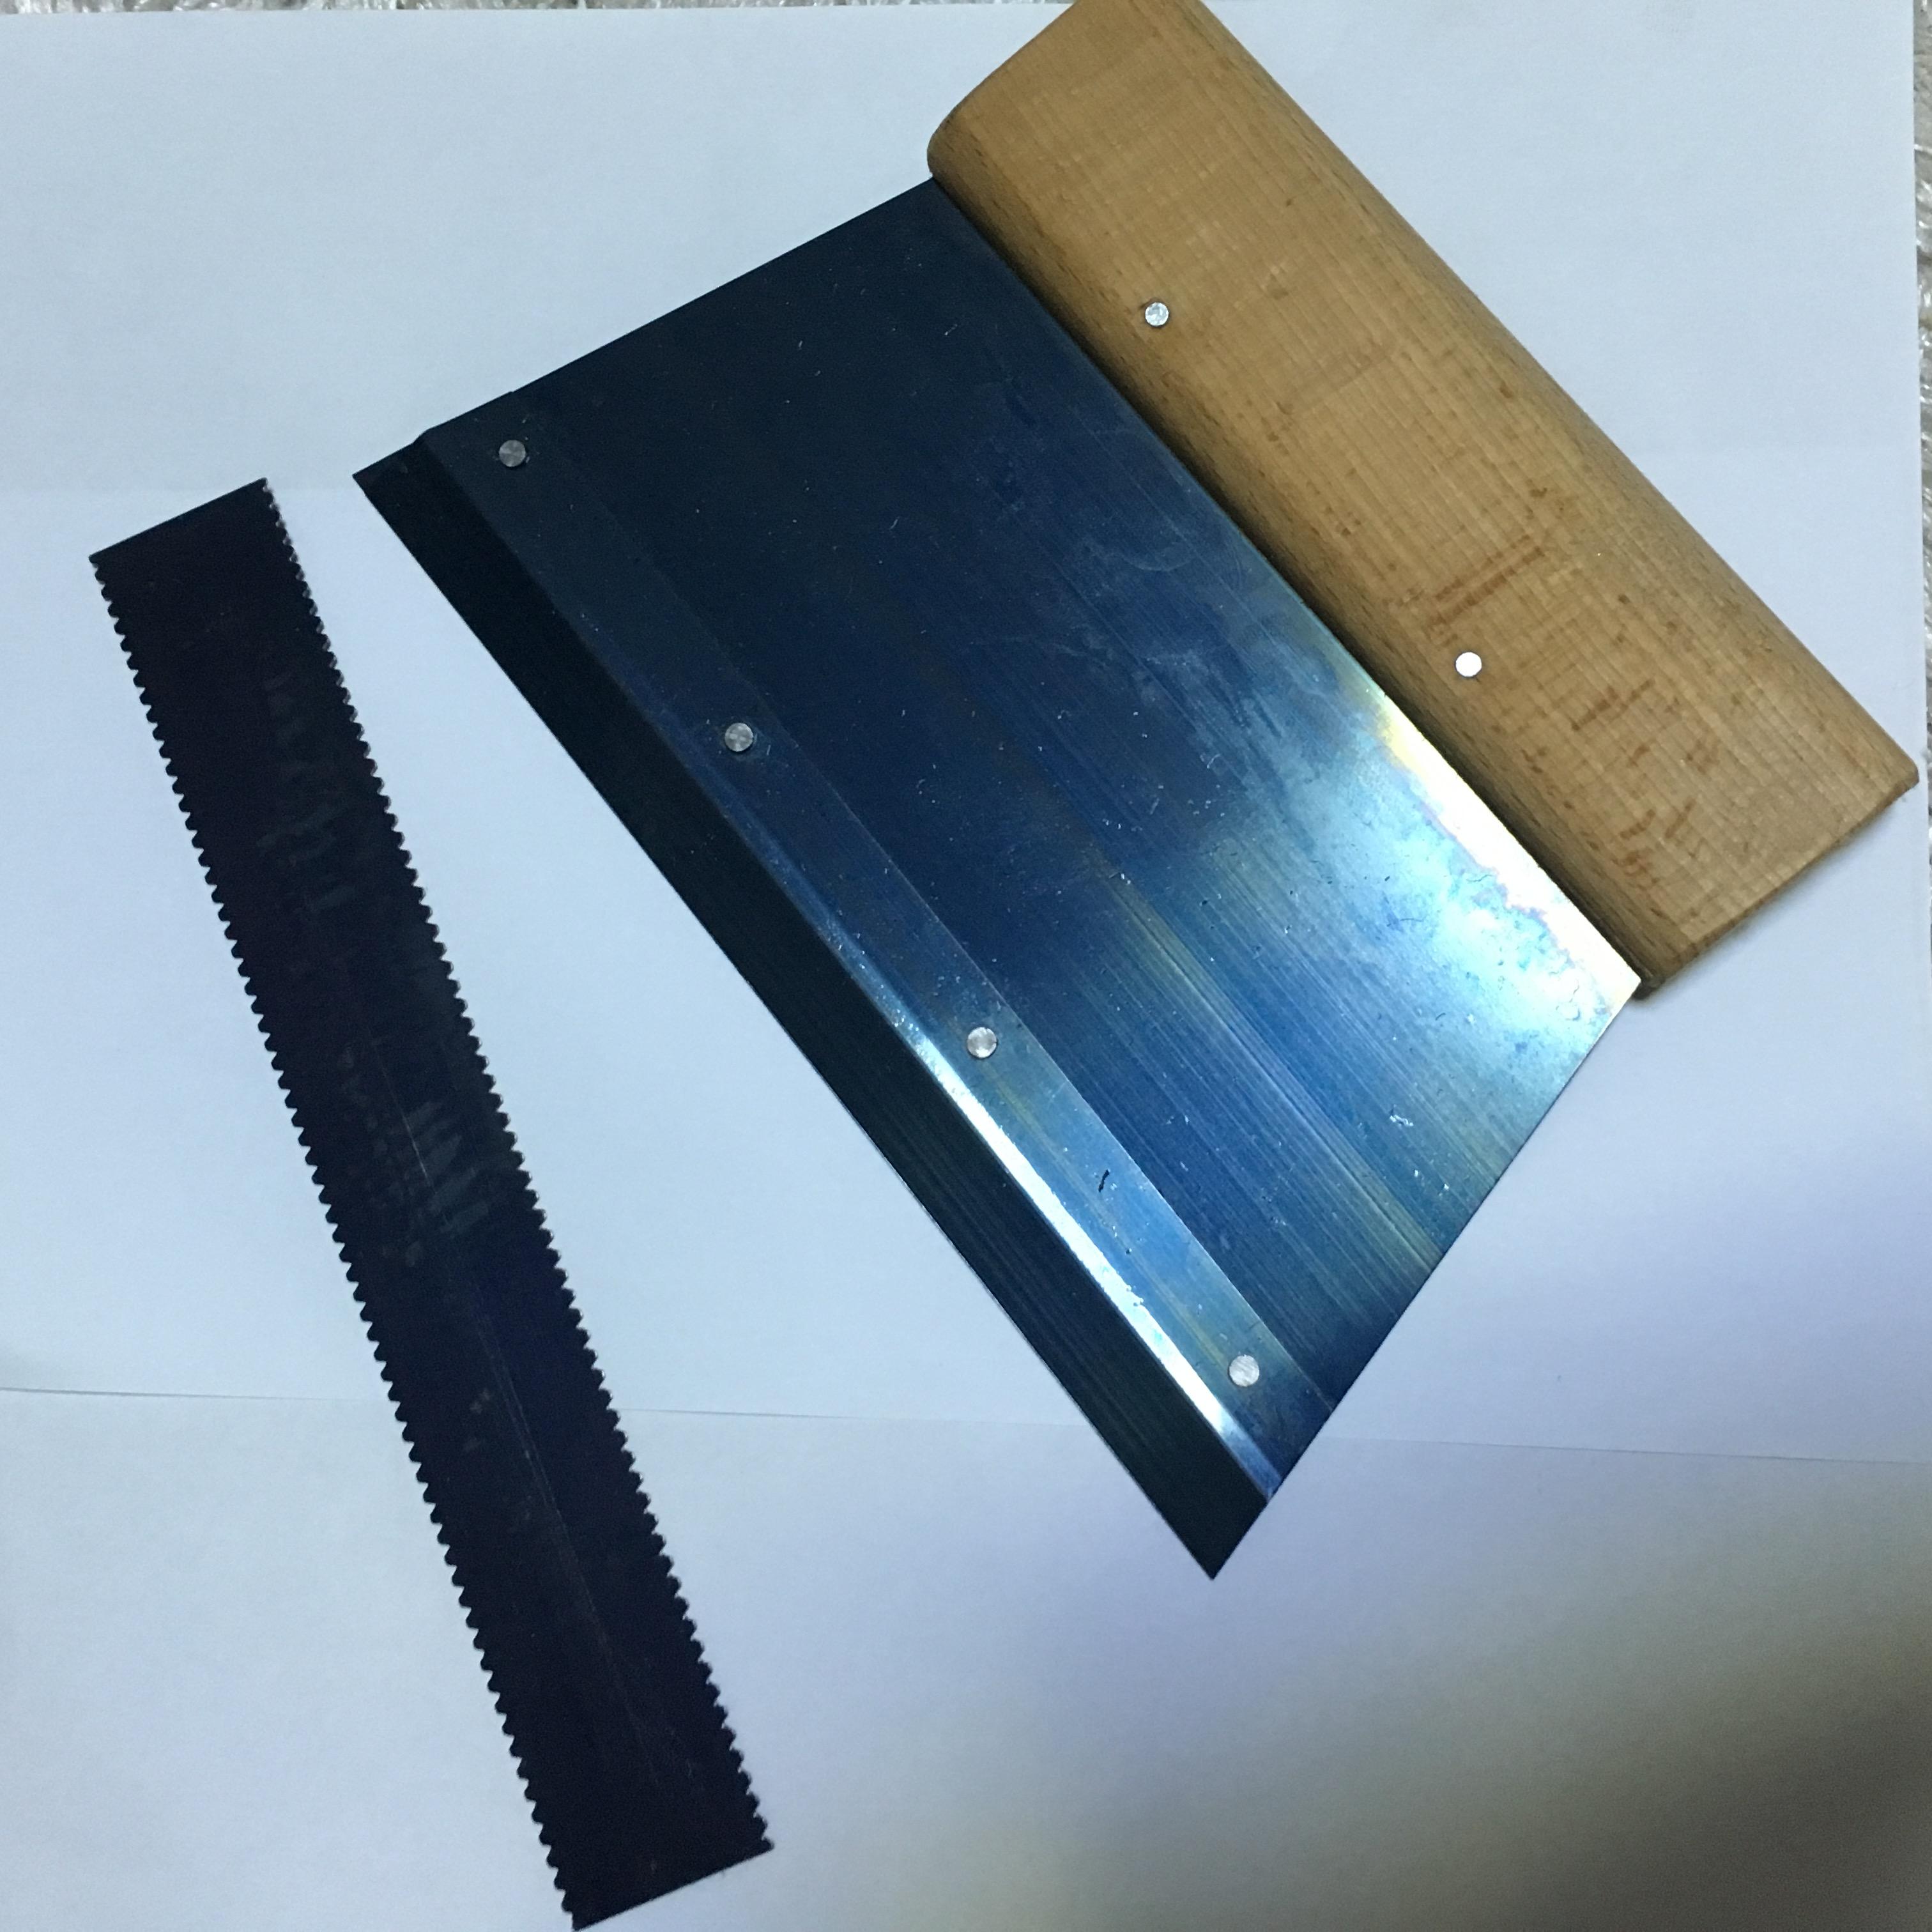 PVC施工工具 胶水刮板 刮胶板 运动地板 齿条锯齿尺子A2塑胶地板